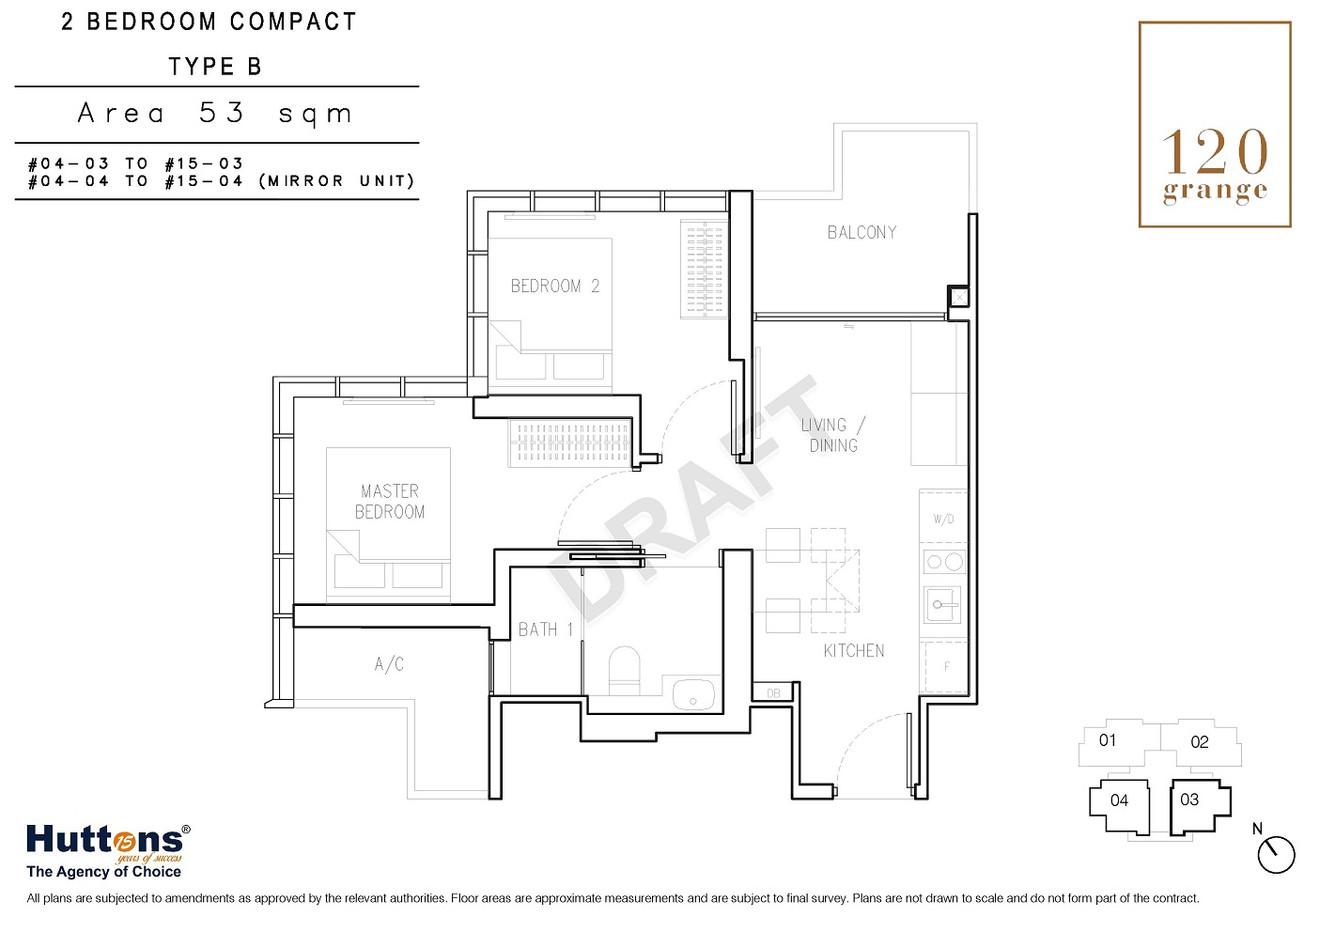 2 Bedrooms Compact Type B